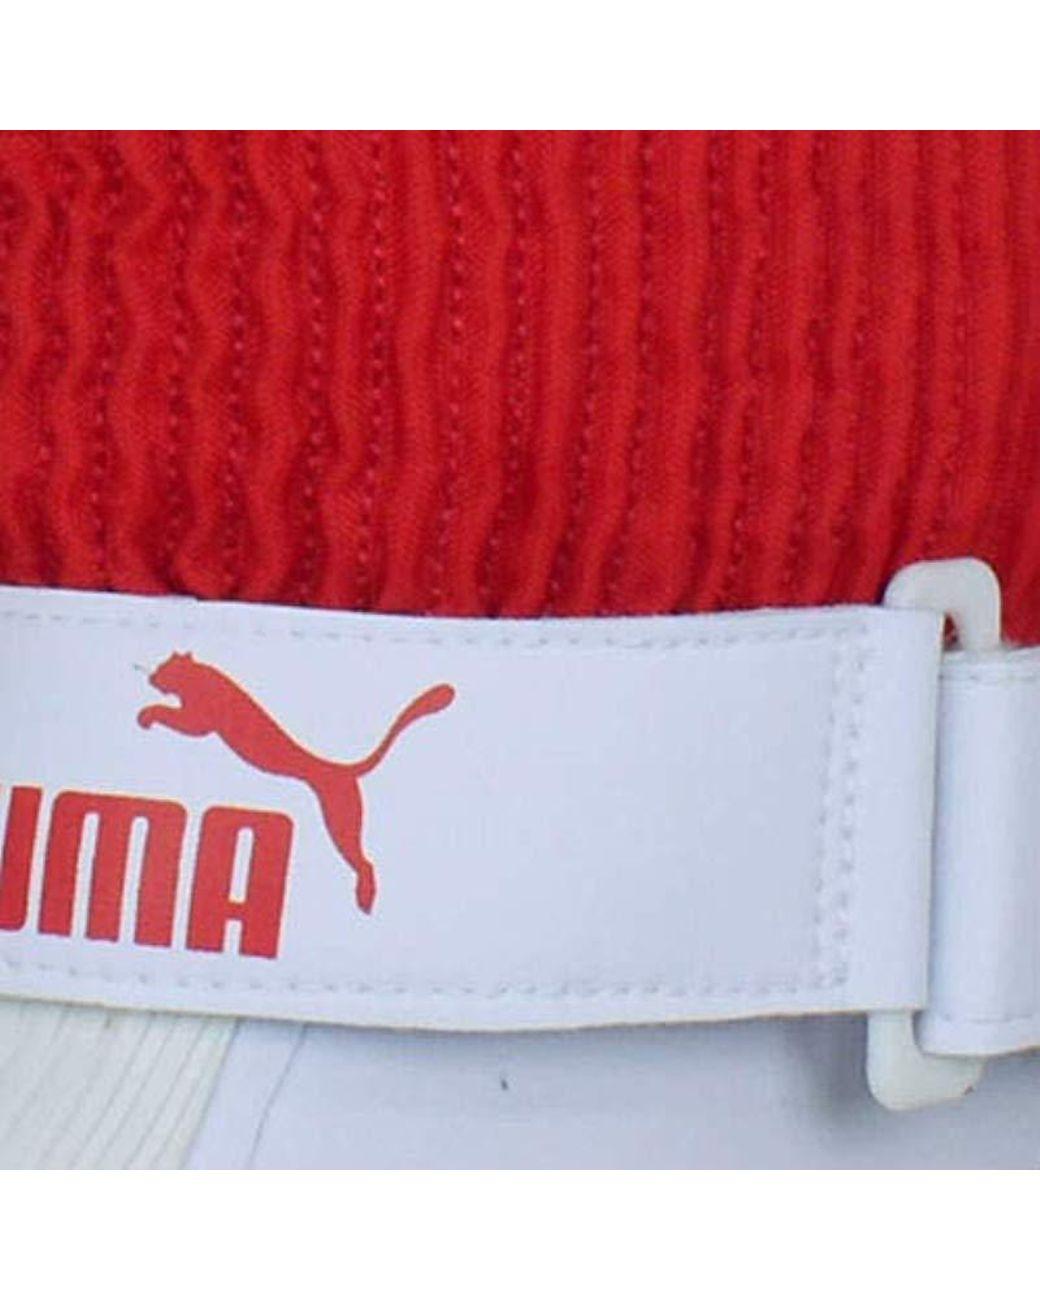 PUMA Alee Volvo Ocean Race Team Gore tex Sailing Boots Shoes